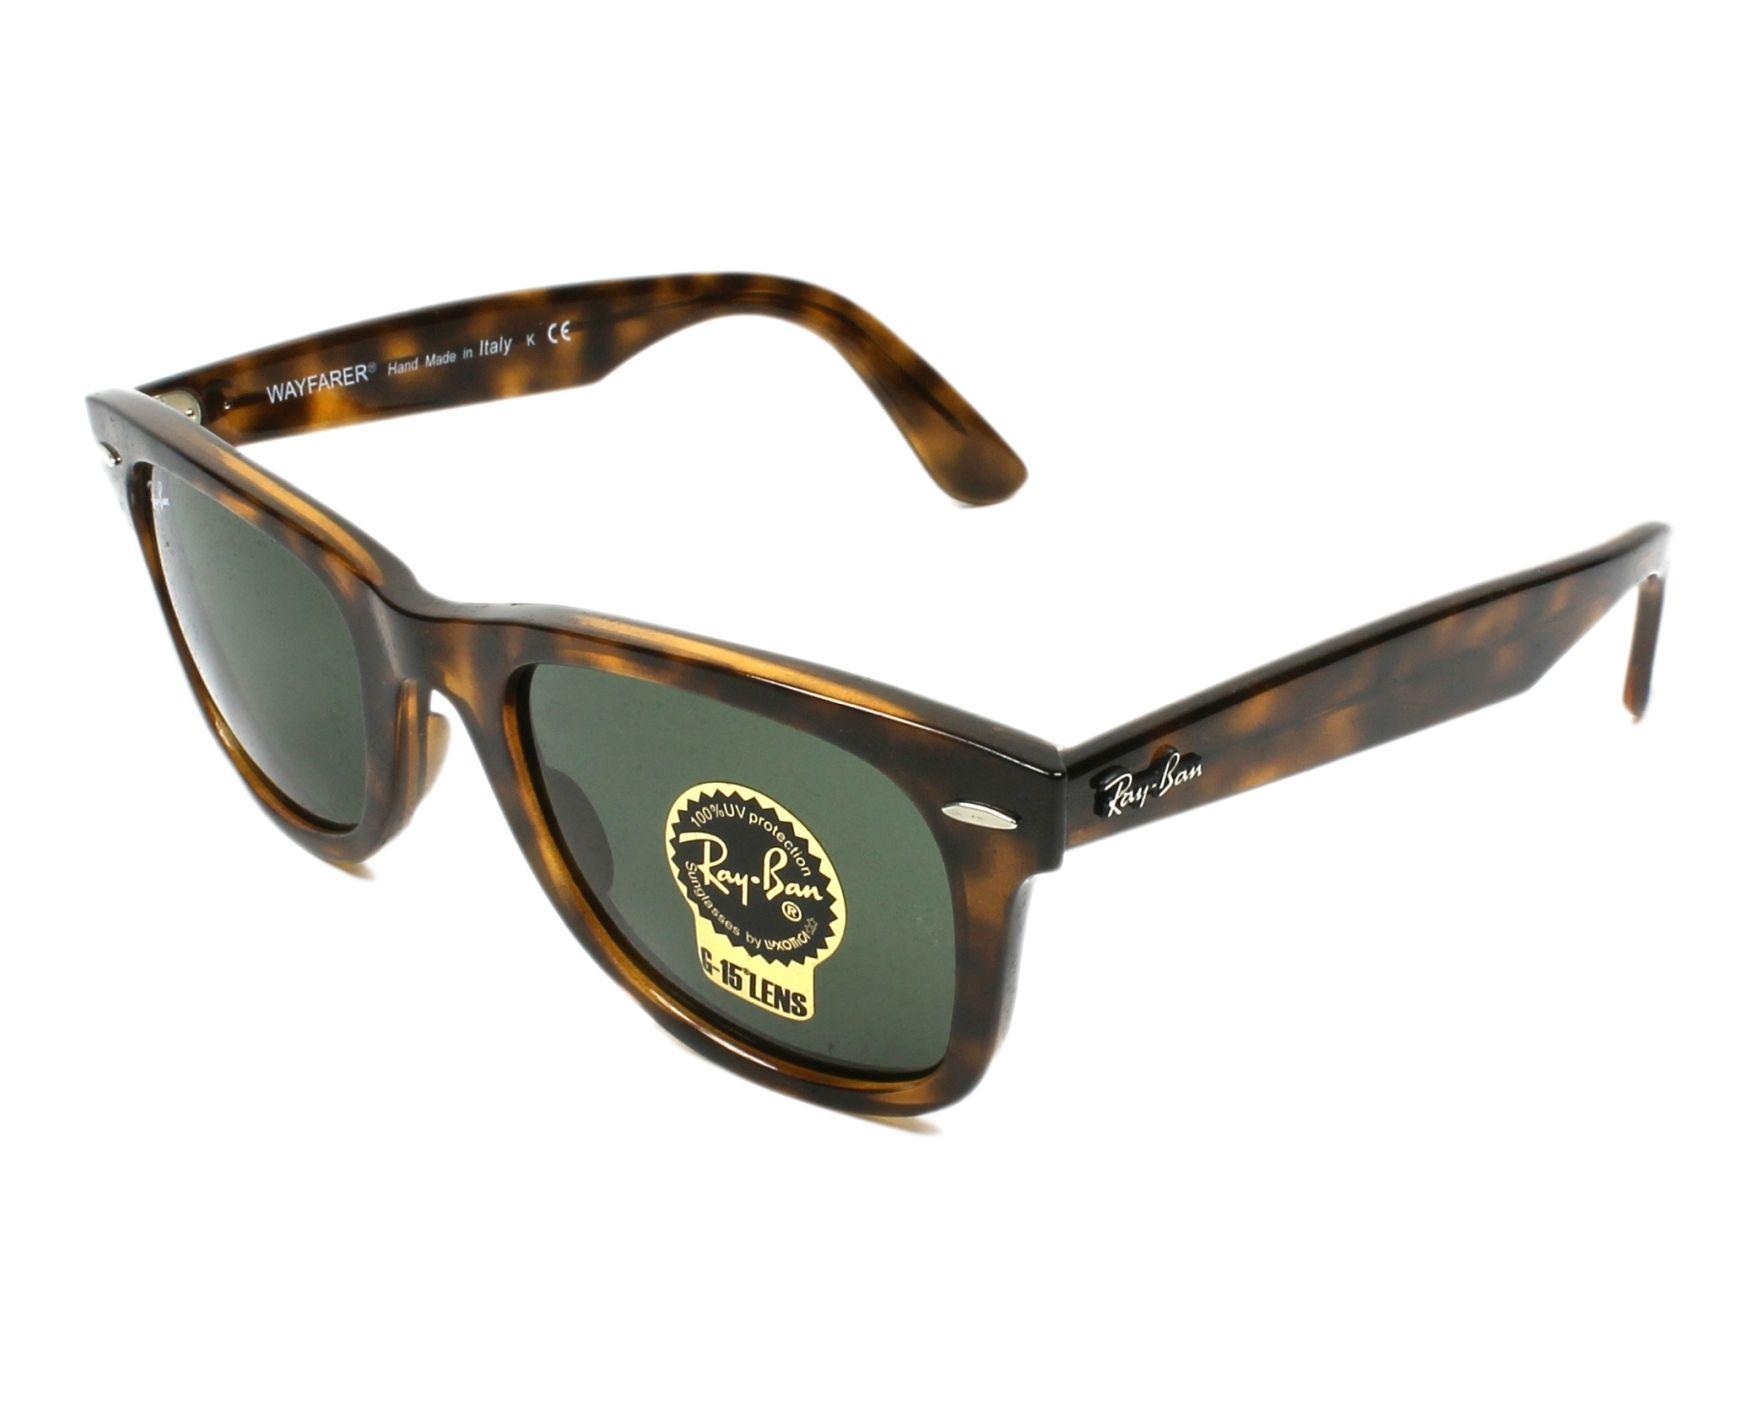 Ray-Ban RB4340 Sonnenbrille Havana 710 50mm GlLIbGB